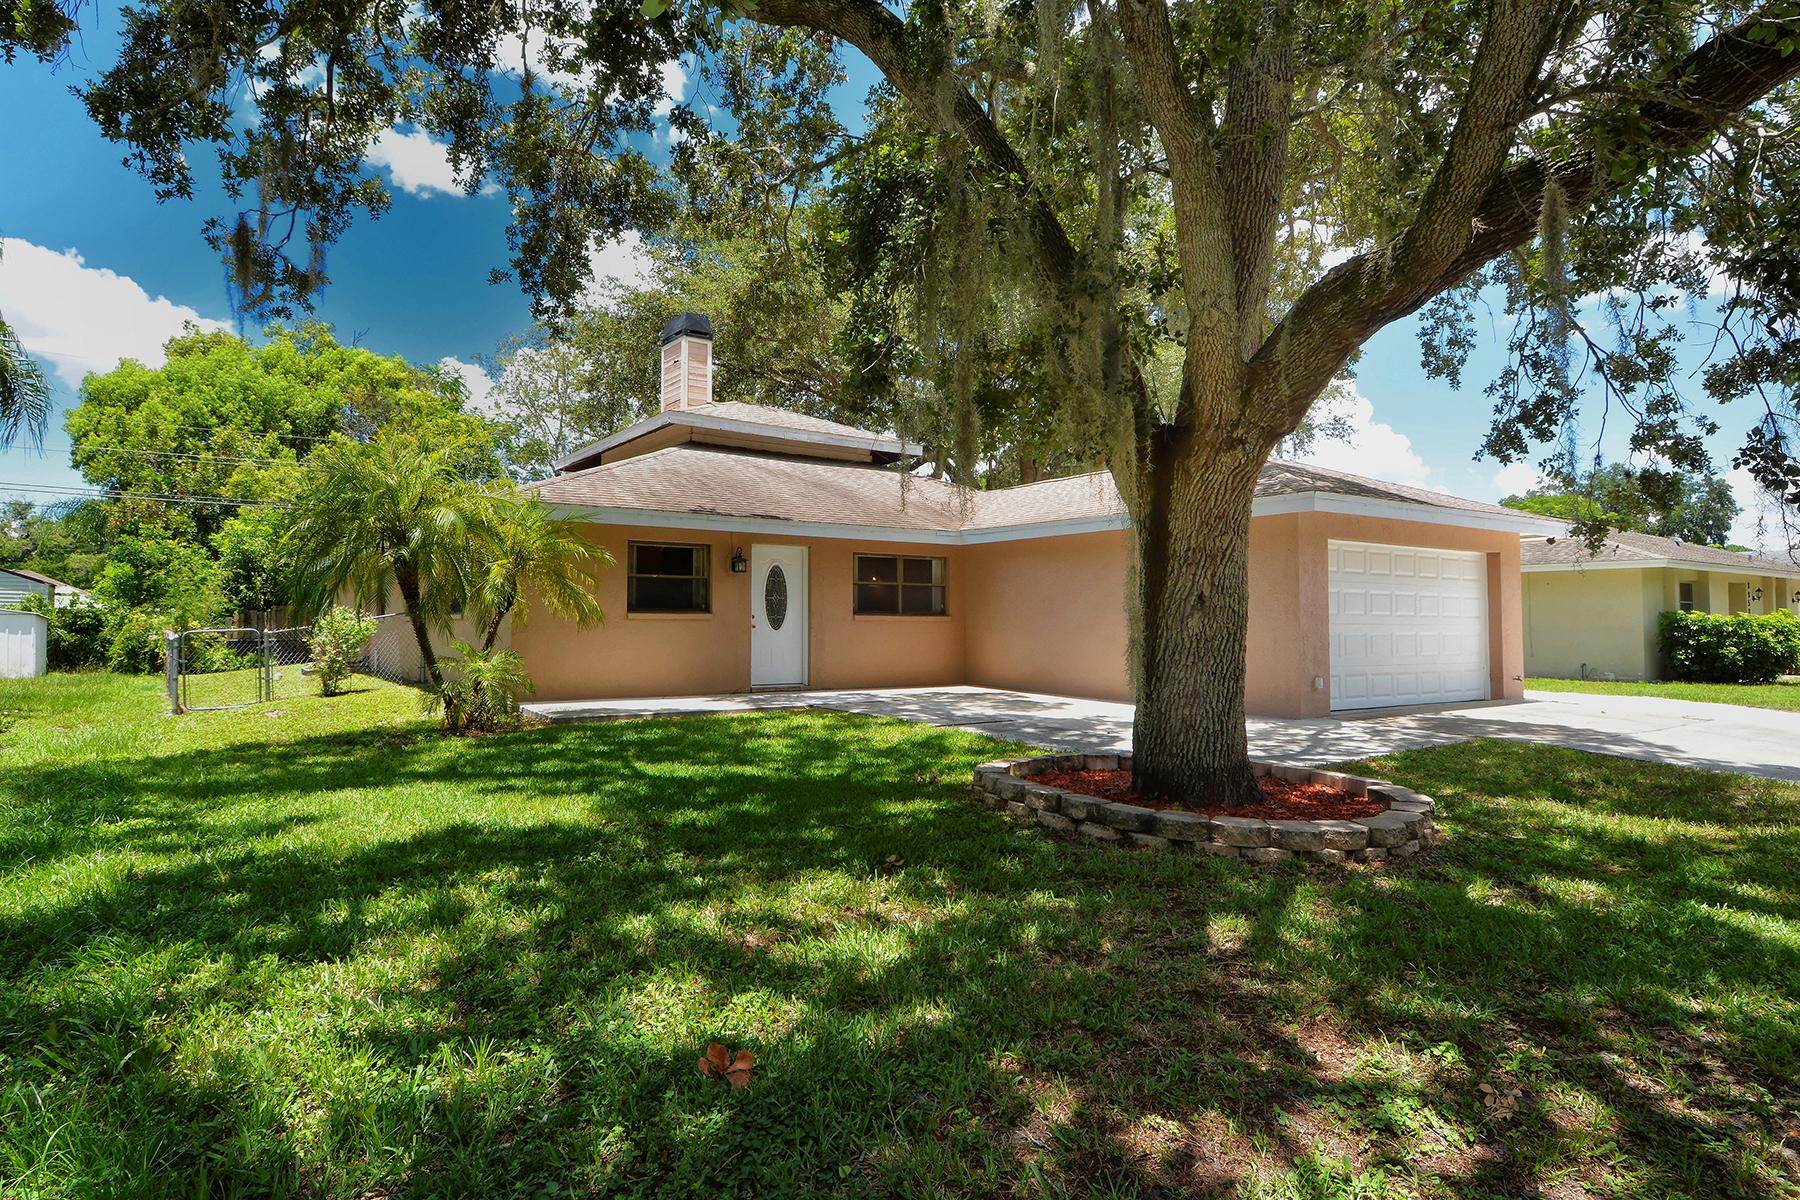 Vivienda unifamiliar por un Venta en SARASOTA 3964 Wake Ave Sarasota, Florida, 34241 Estados Unidos